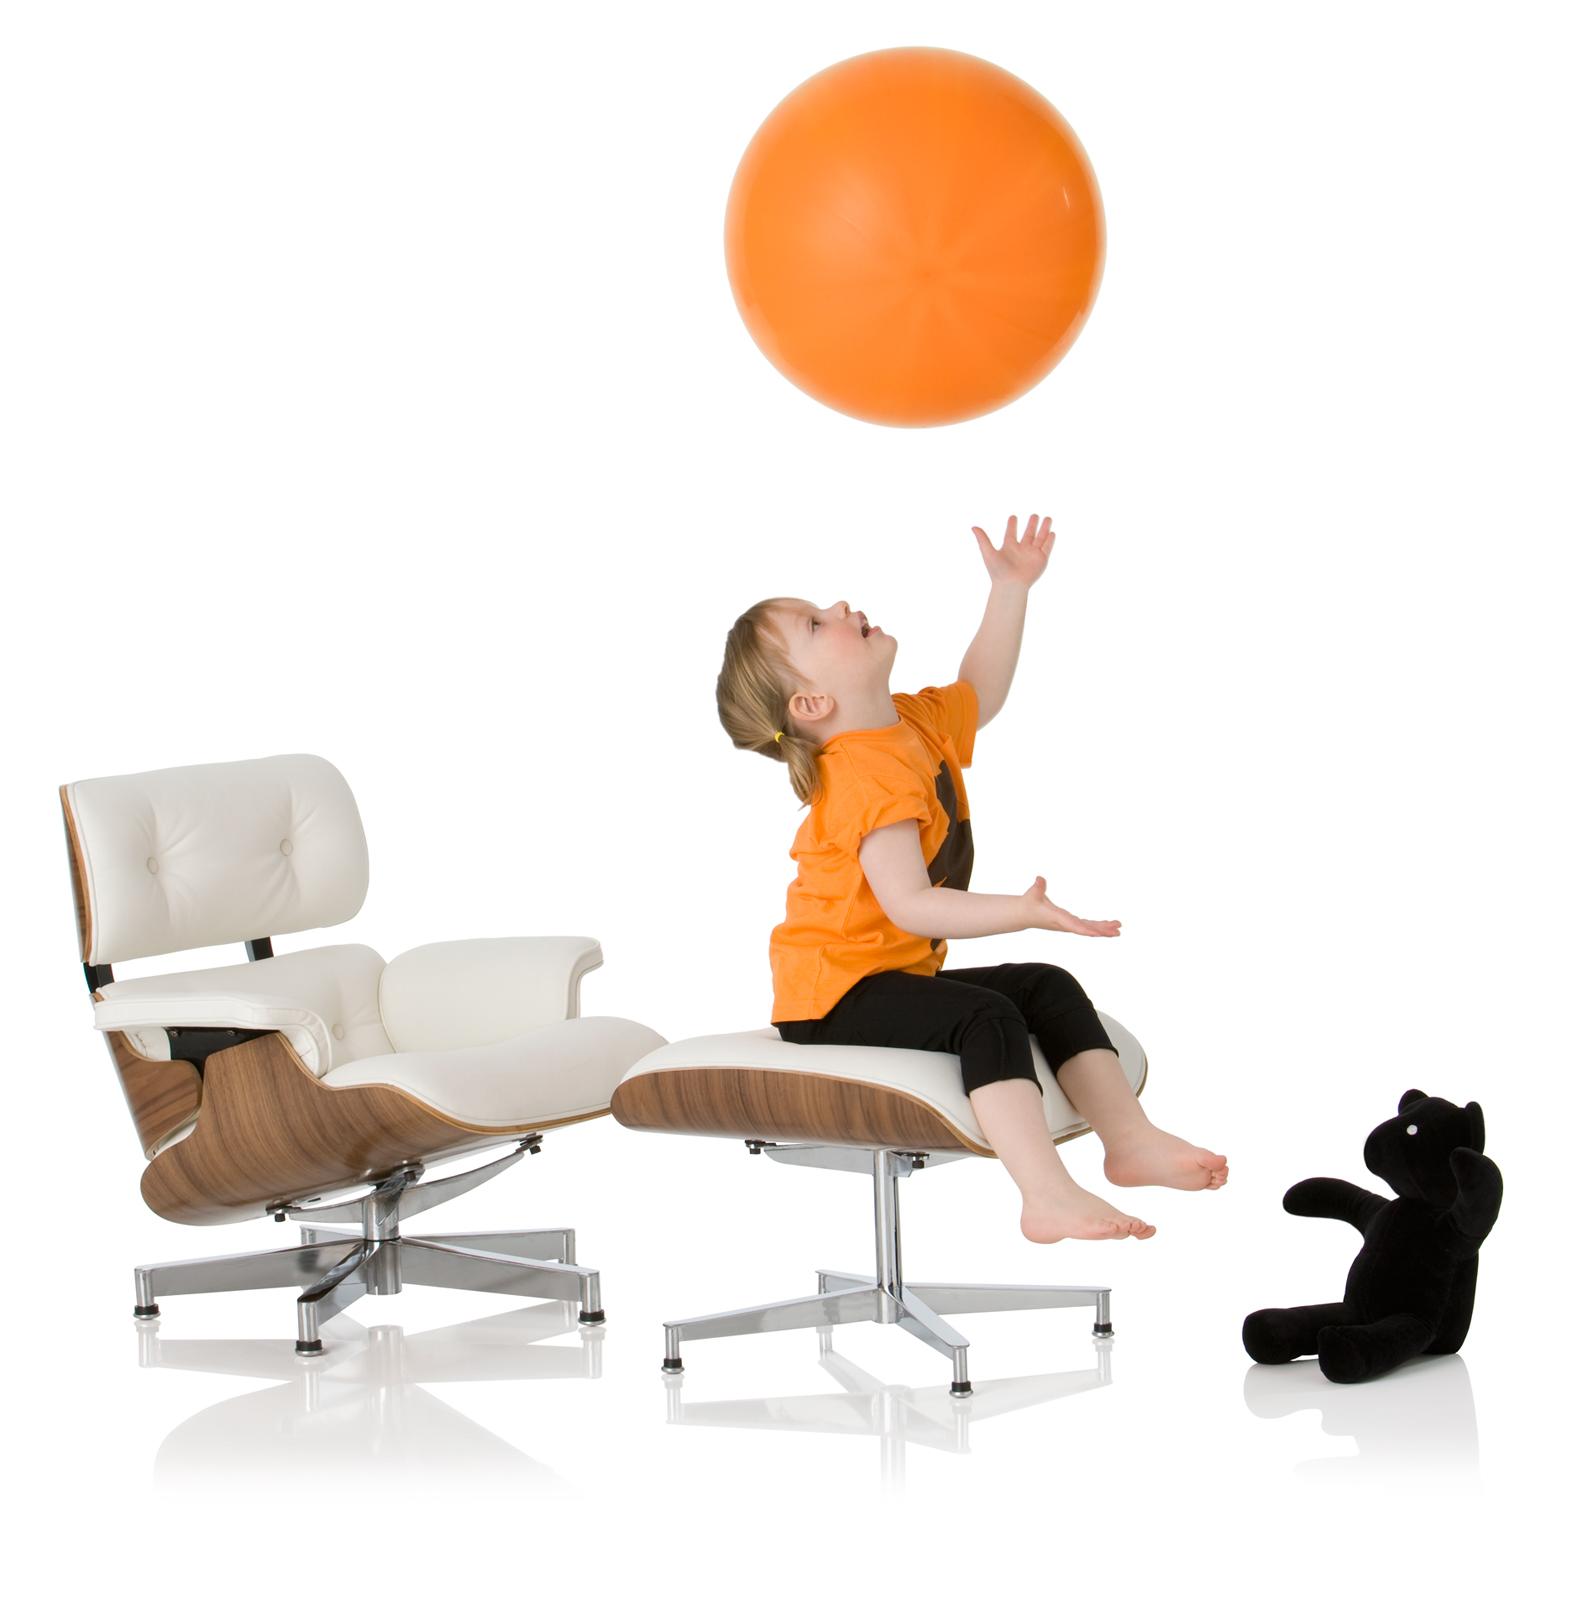 Mini Eames Lounge chair for children